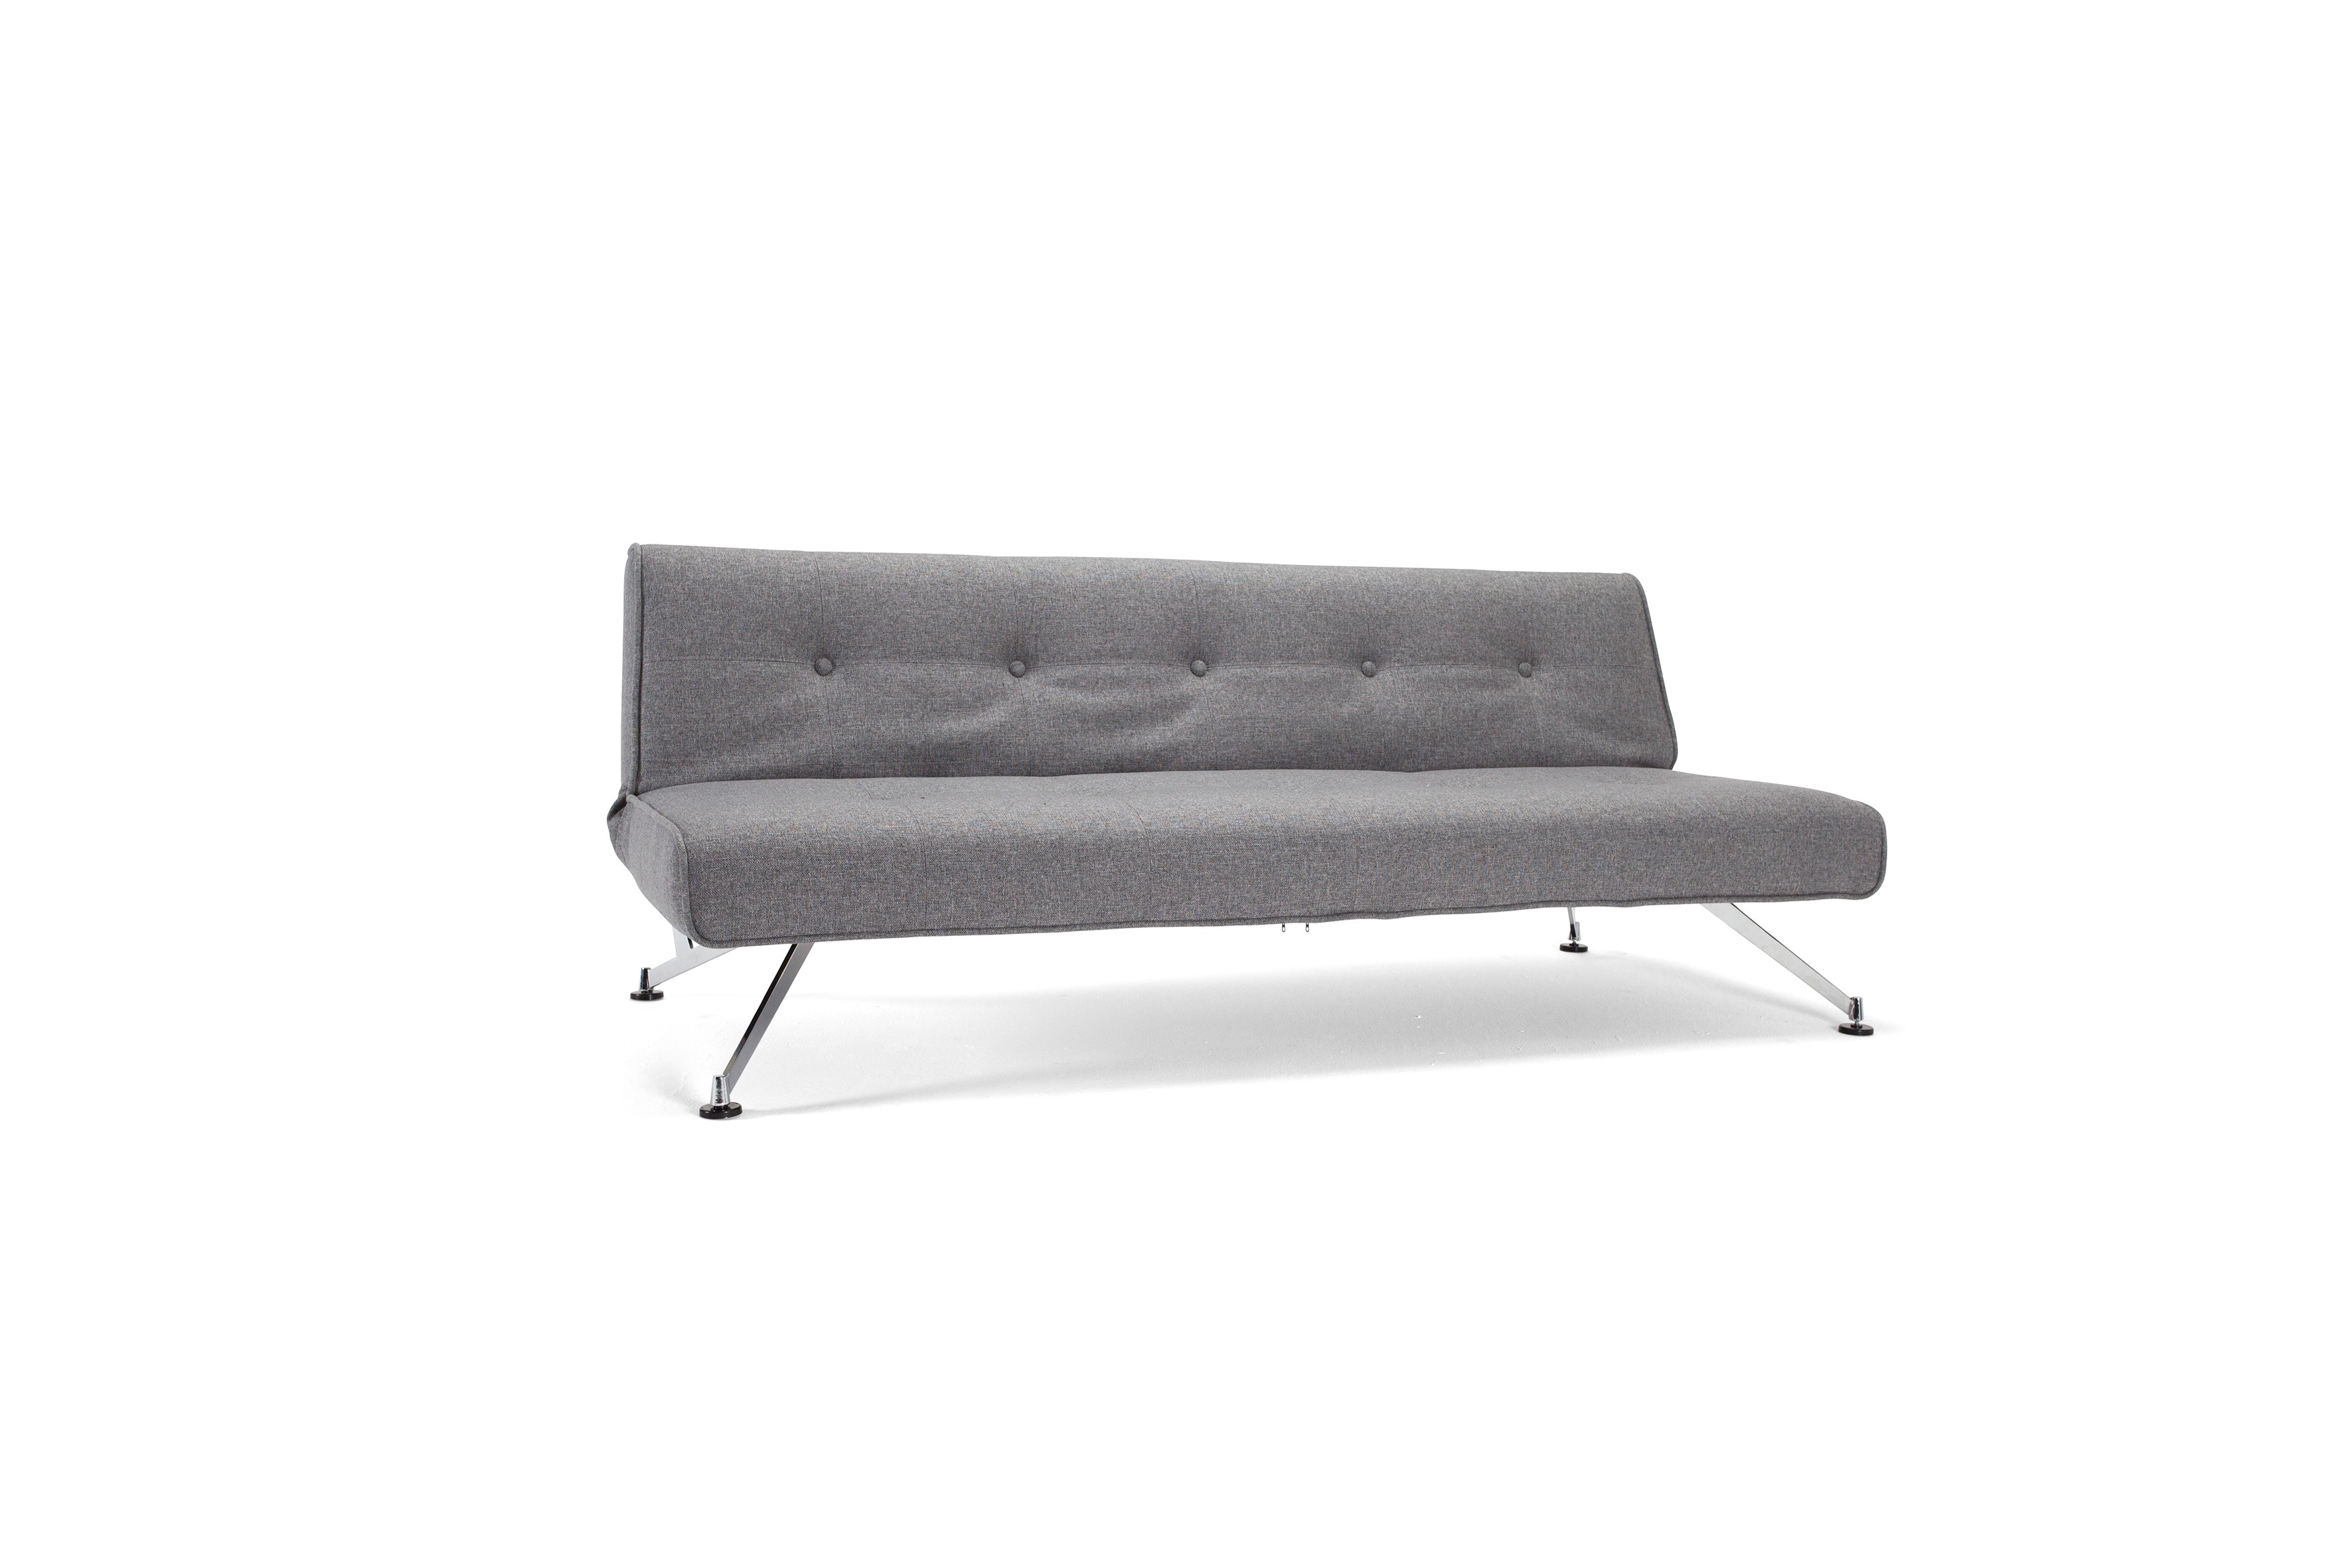 Clubber sovesofa, 115 x 200 cm. Faunal, Black.-20